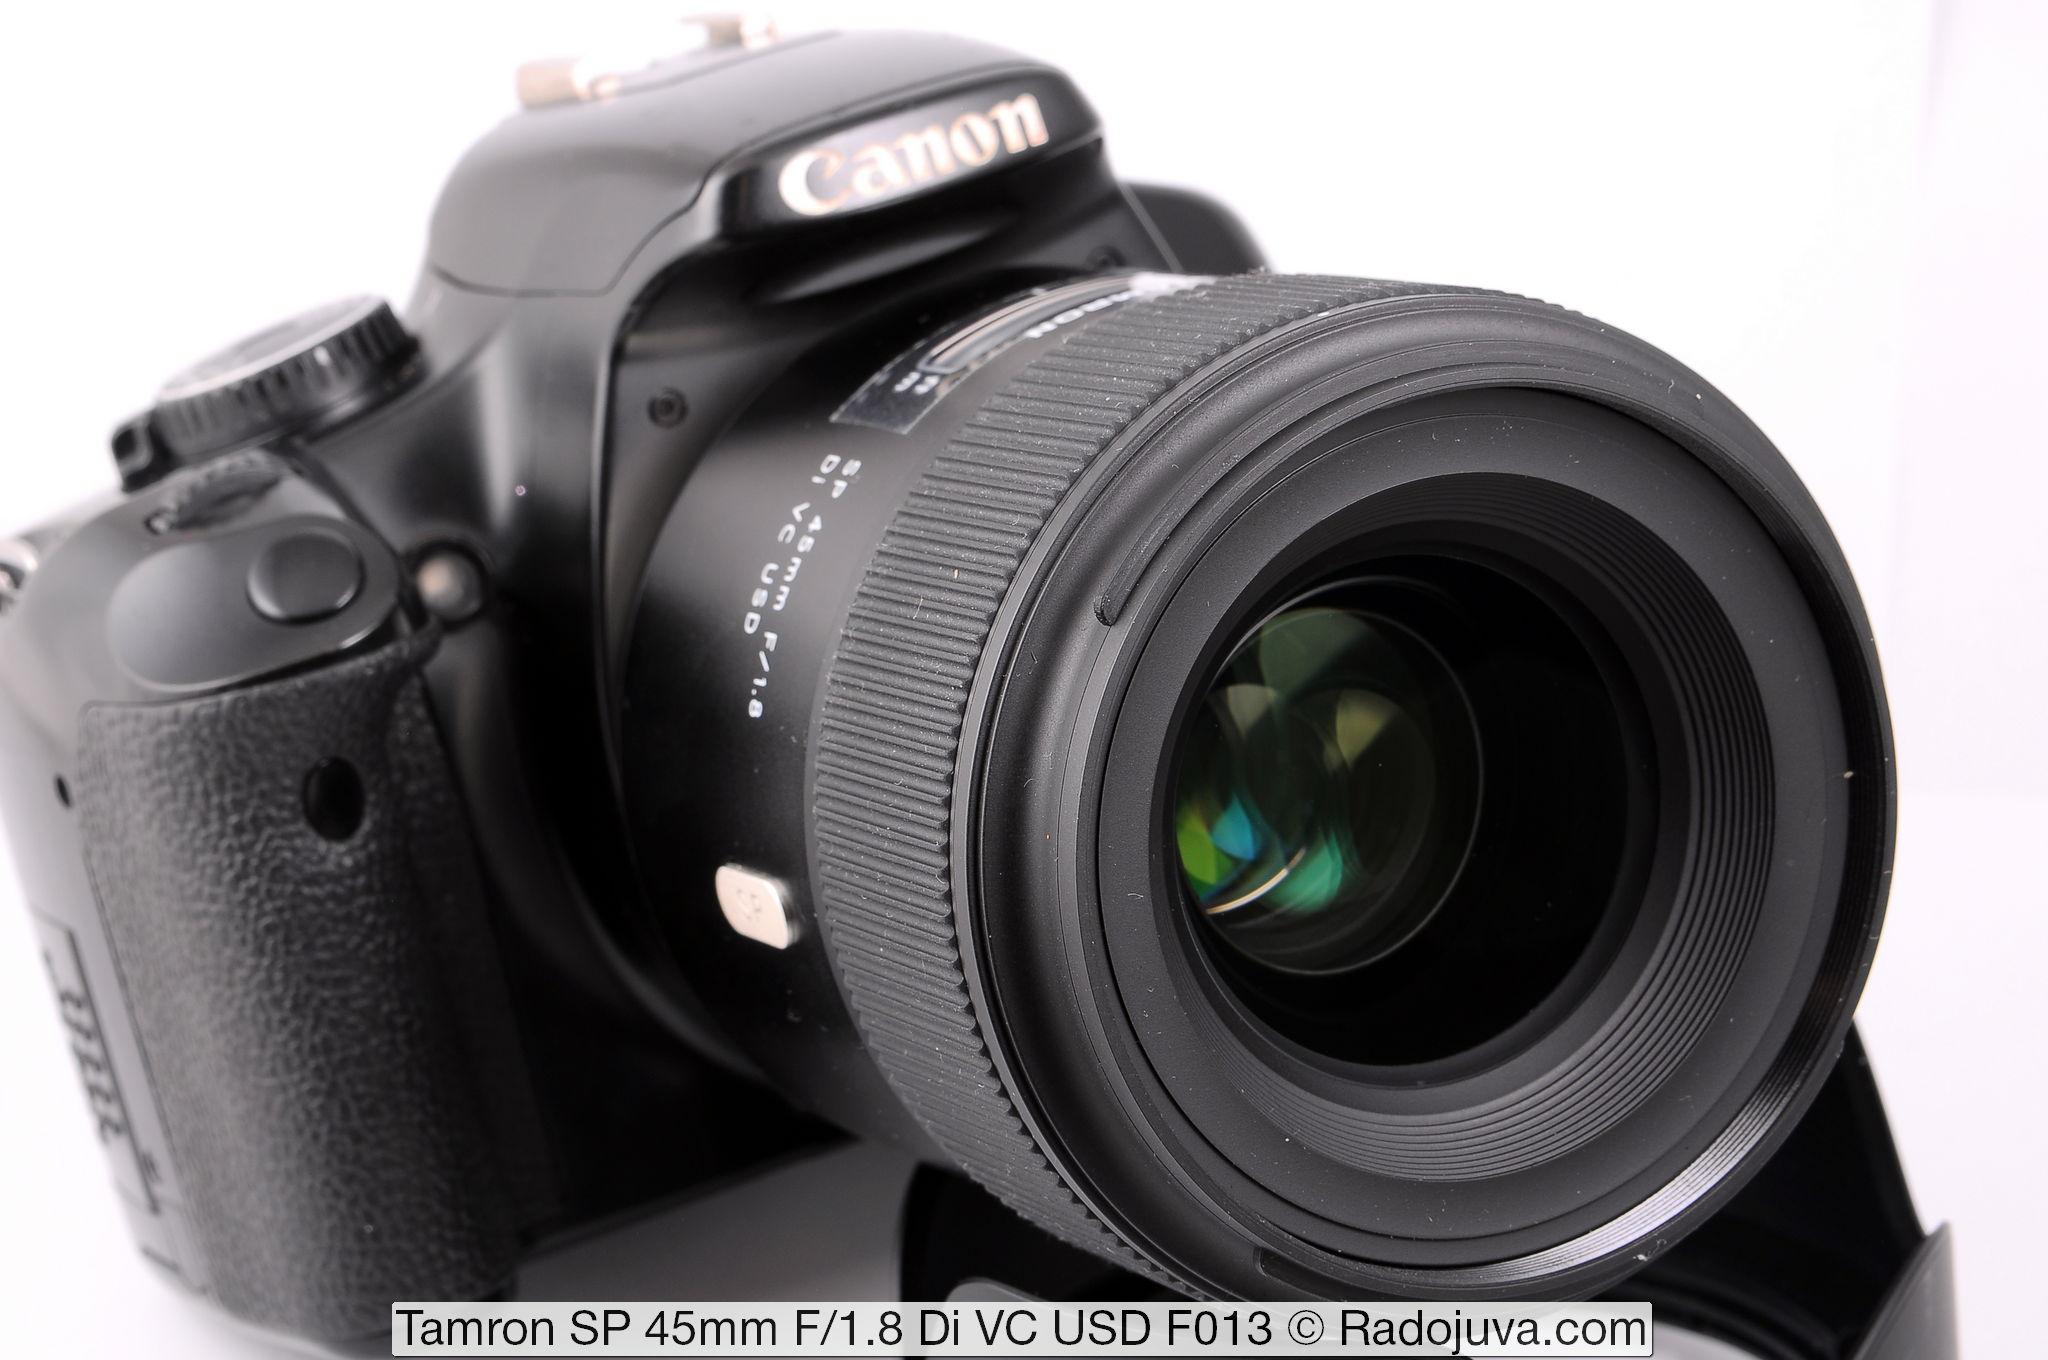 Tamron SP 45mm F/1.8 Di VC USD F013